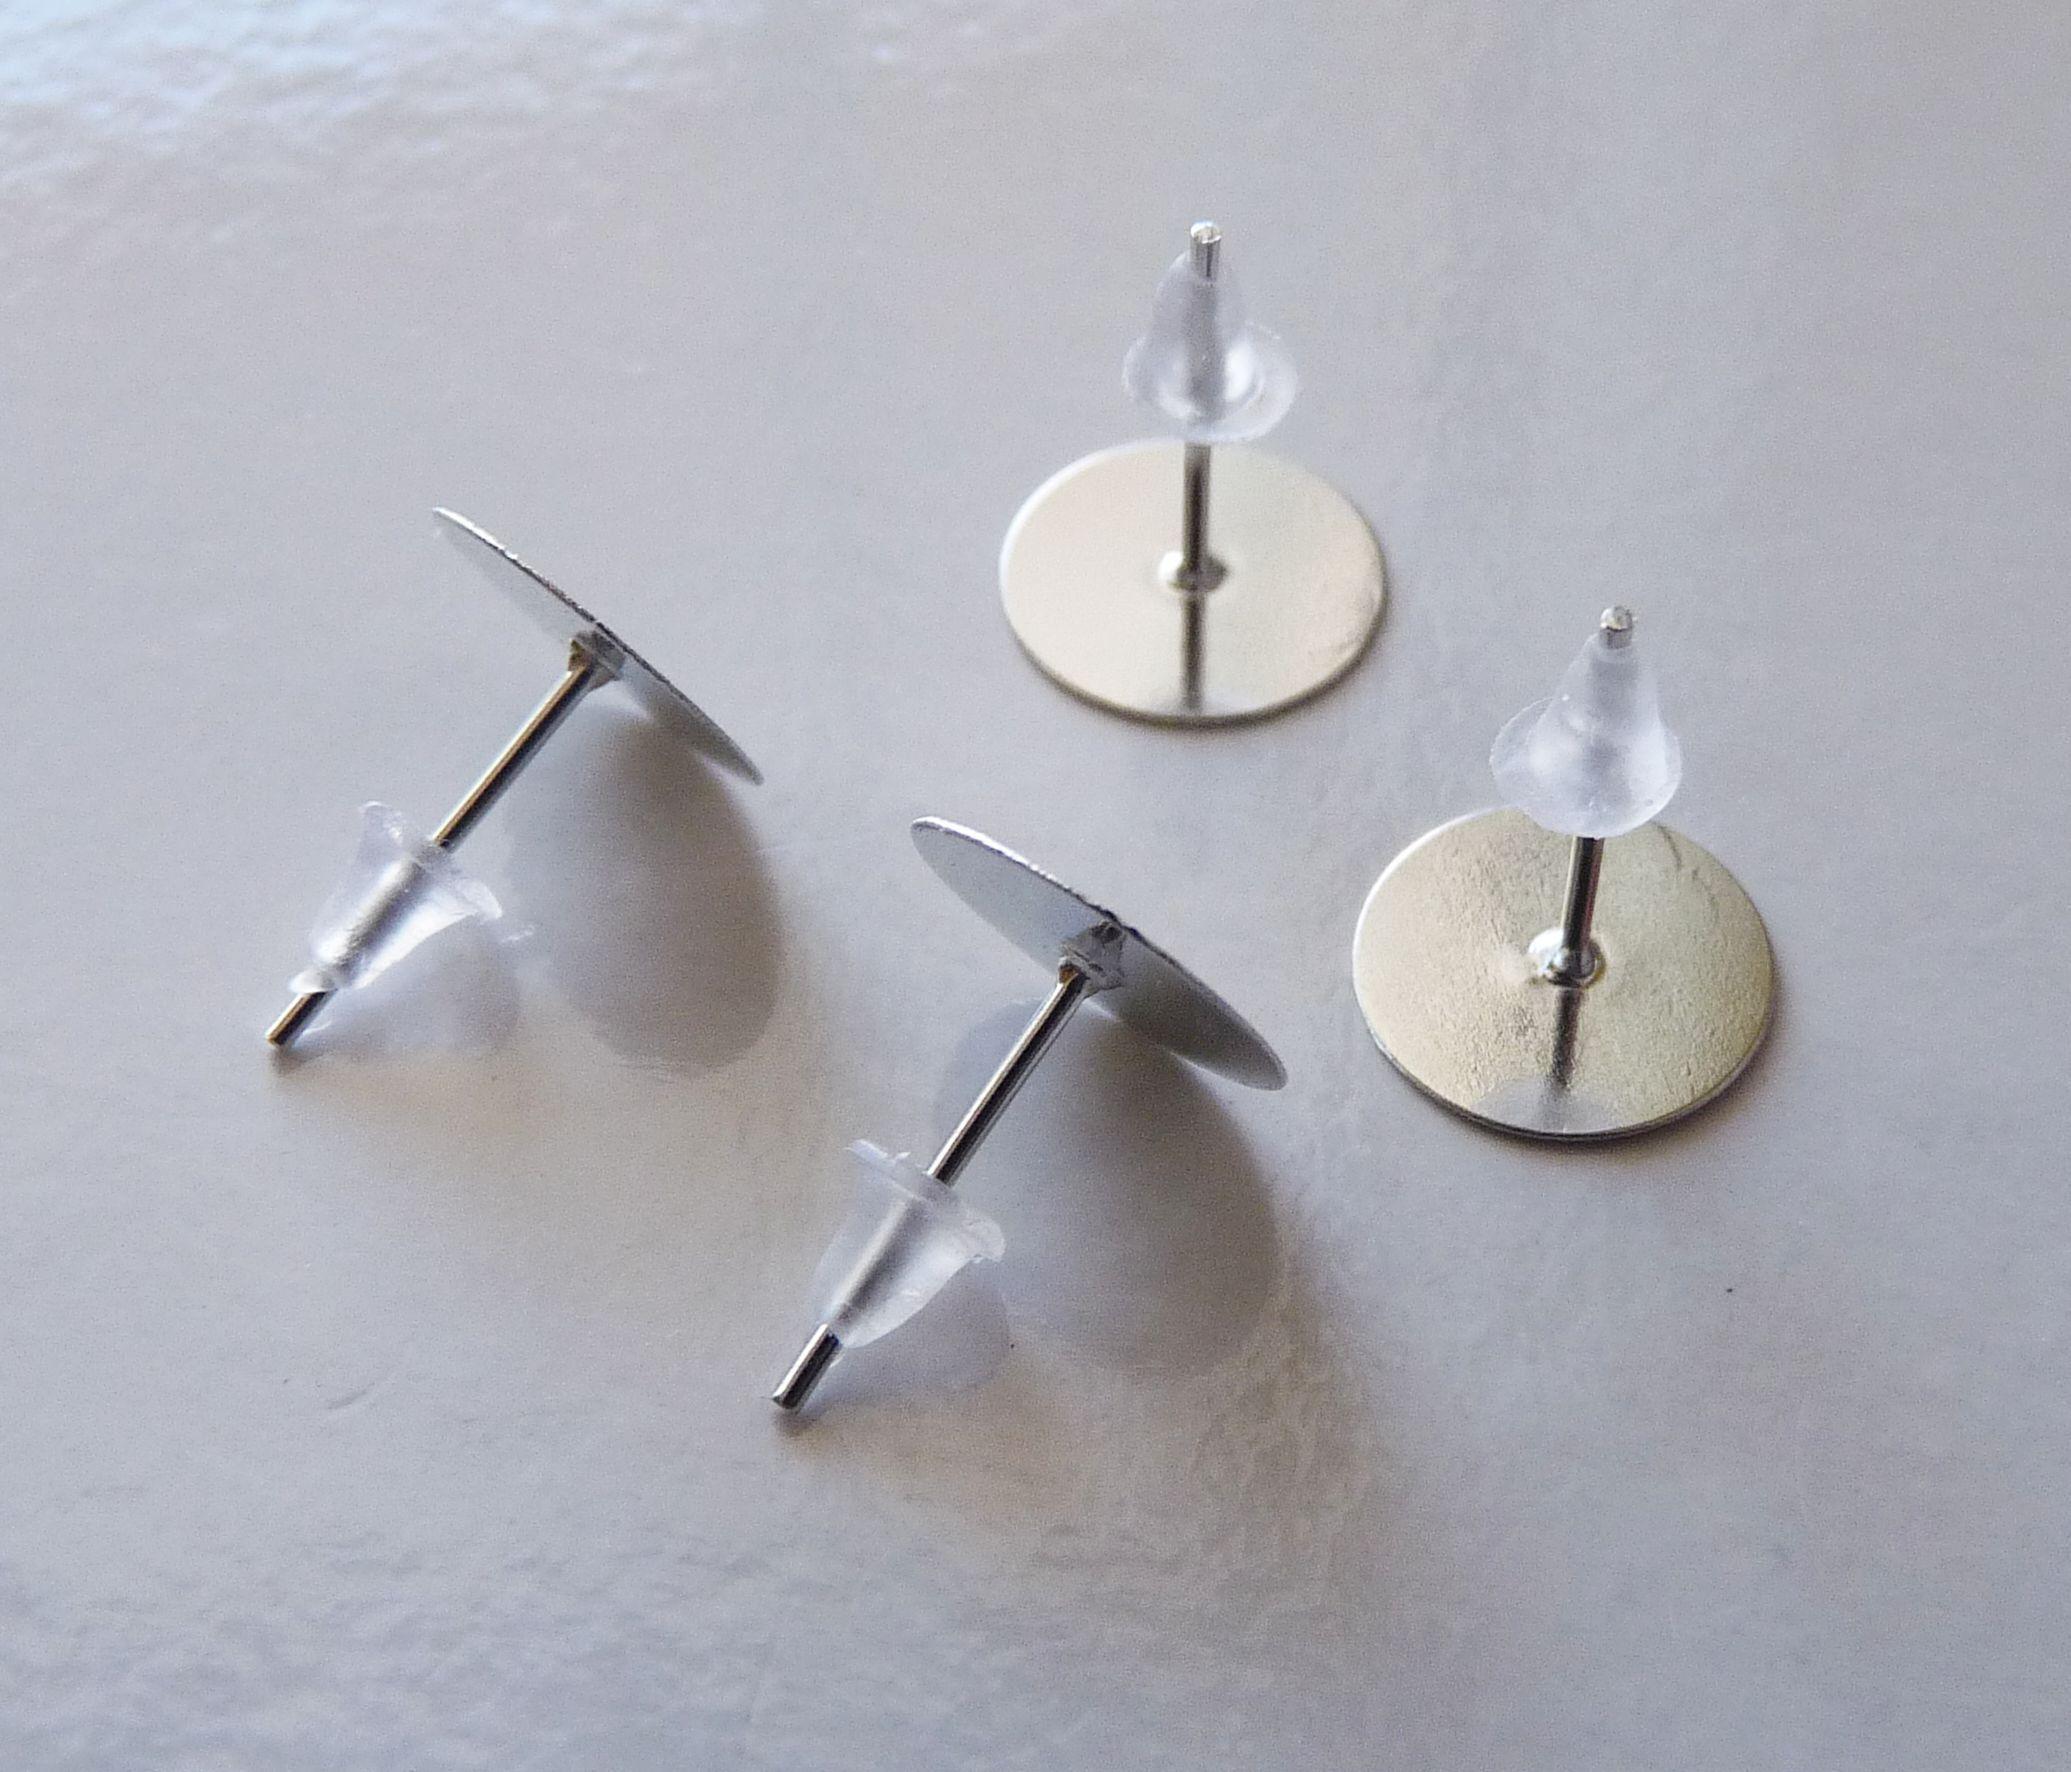 edae44936 100x Earring Studs, 10mm Flat Back Earring Studs, Surgical Steel Ear Studs  Flat Pad Earring Posts, Flat Post Earrings, Earring Base (ES14)